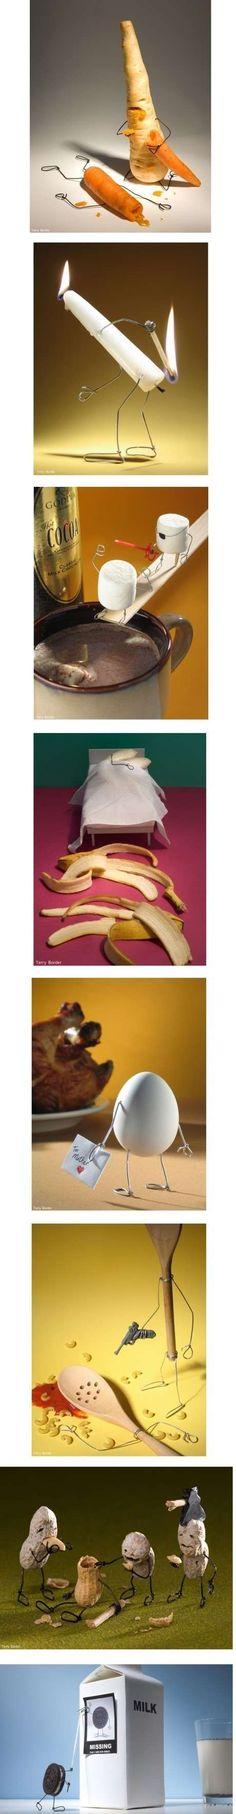 Creative Food Humor